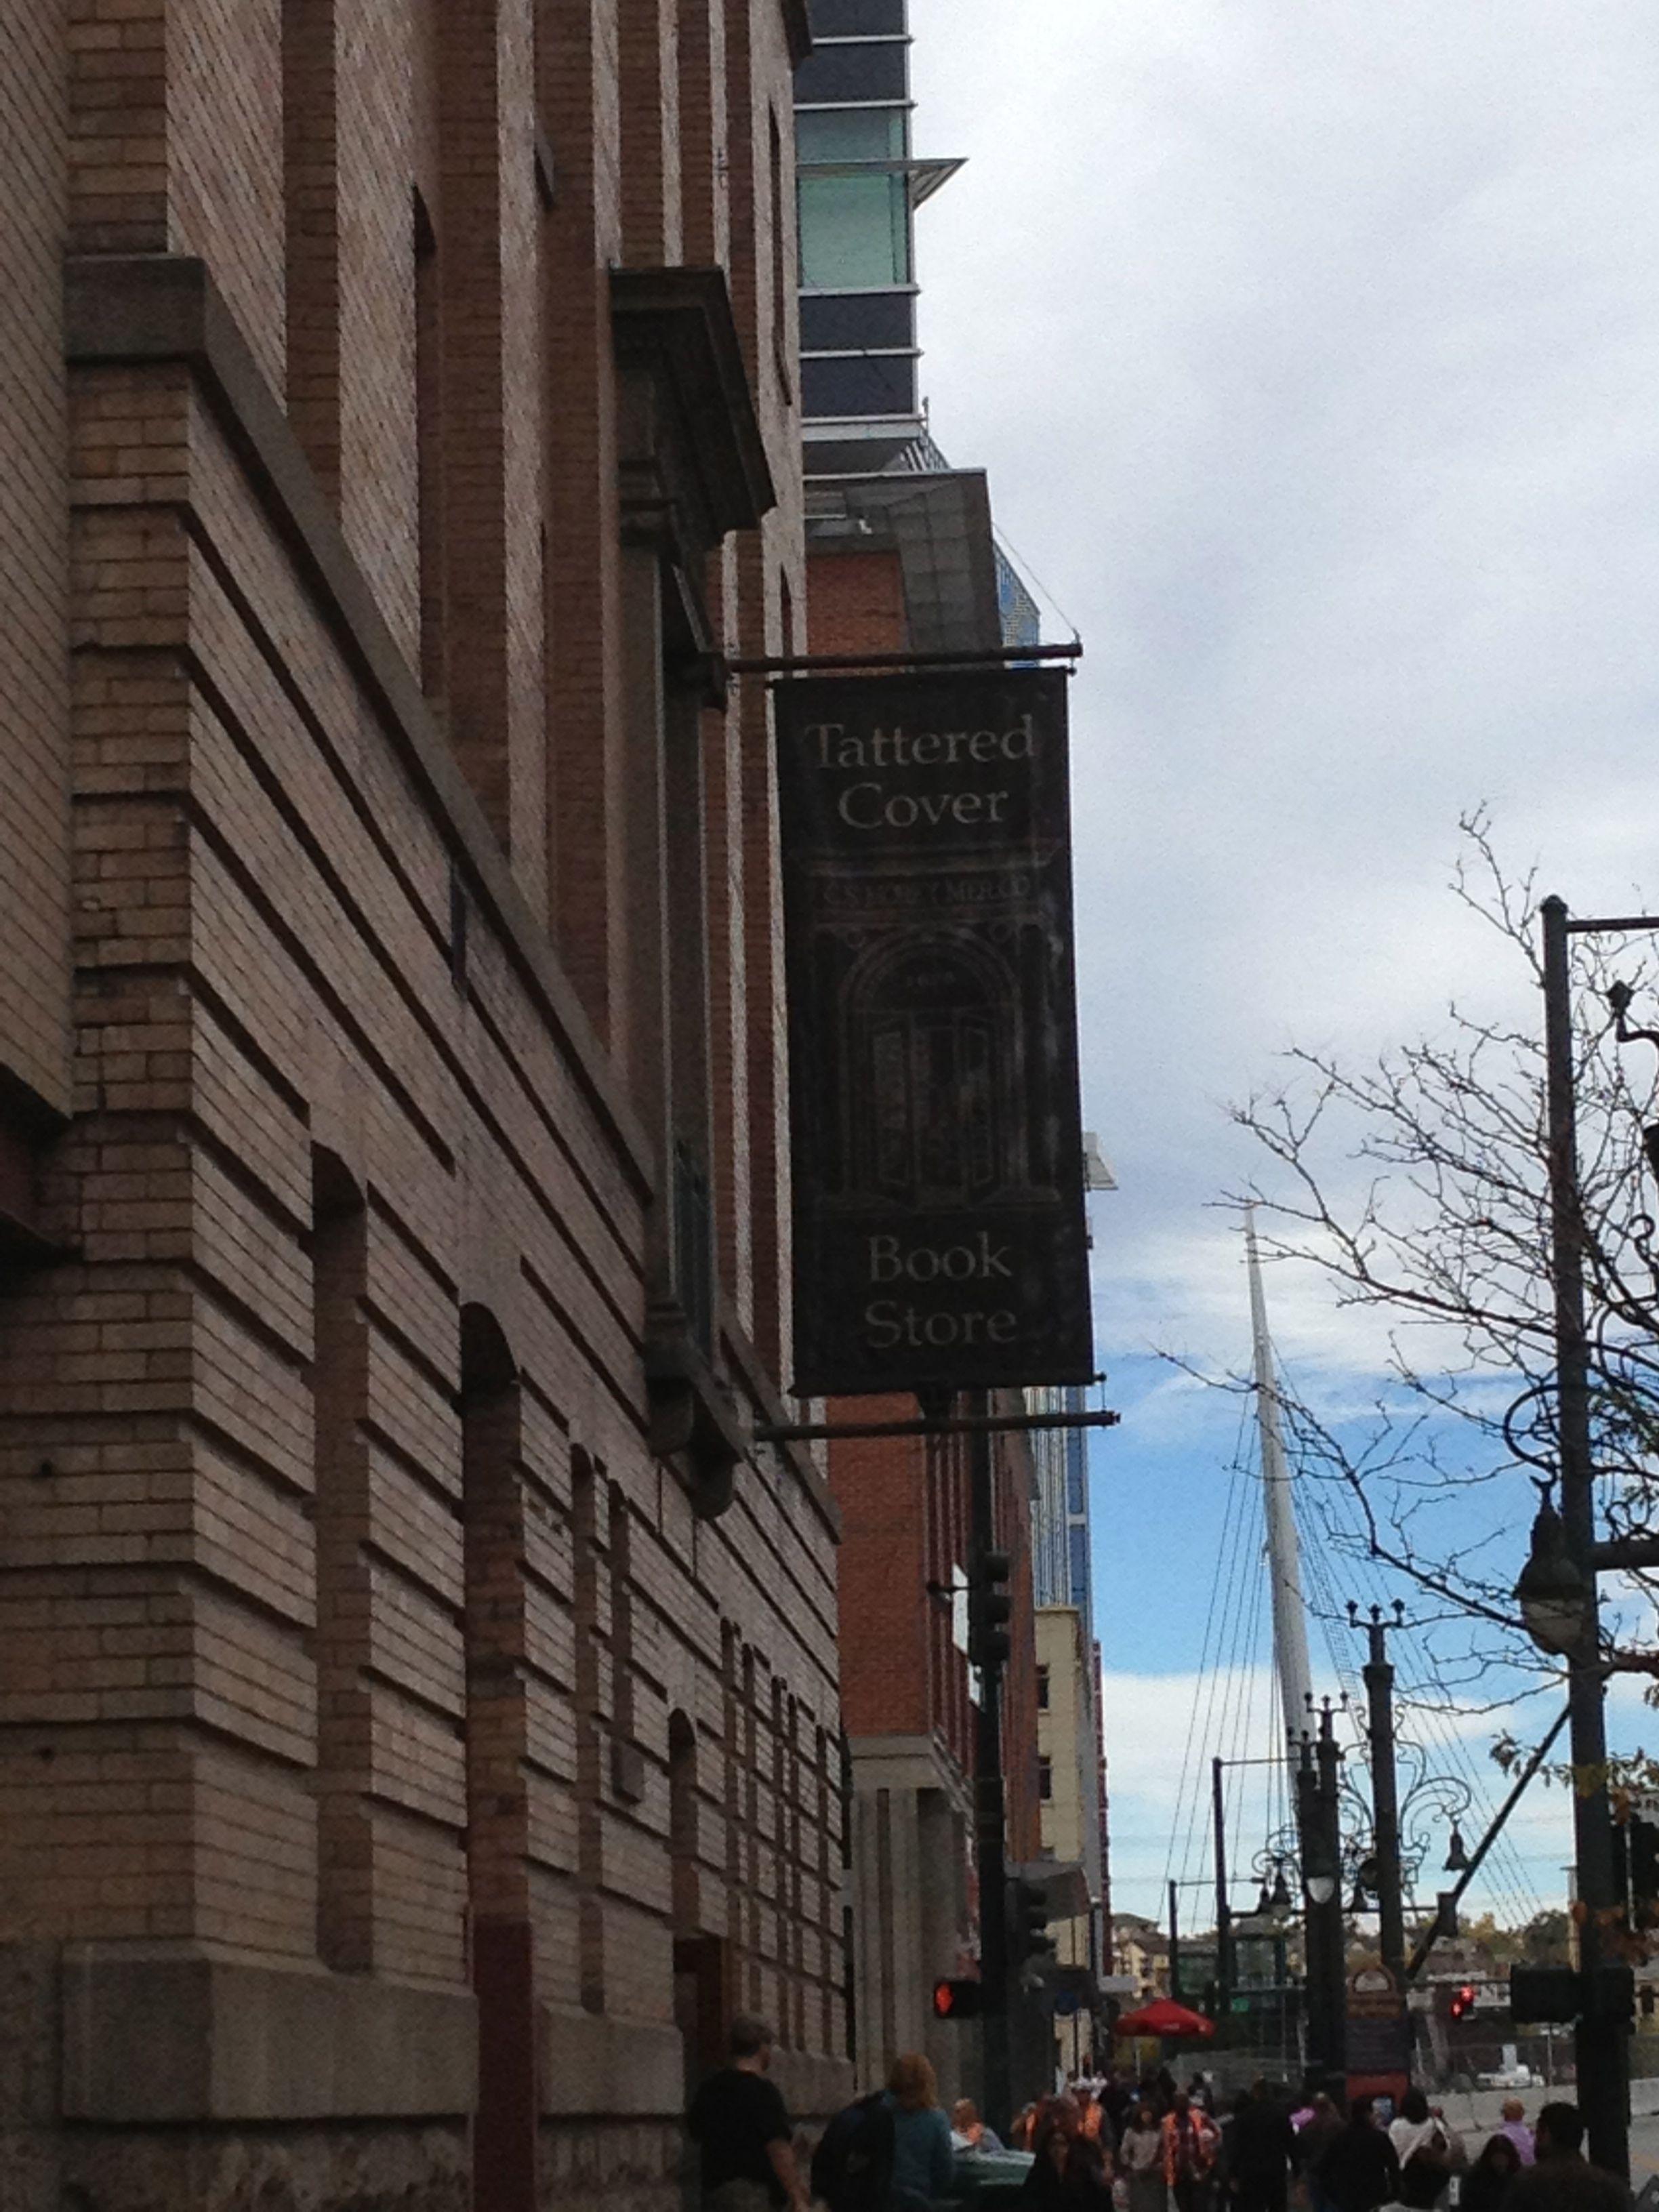 Tattered Cover Book Store, Denver. Love It!